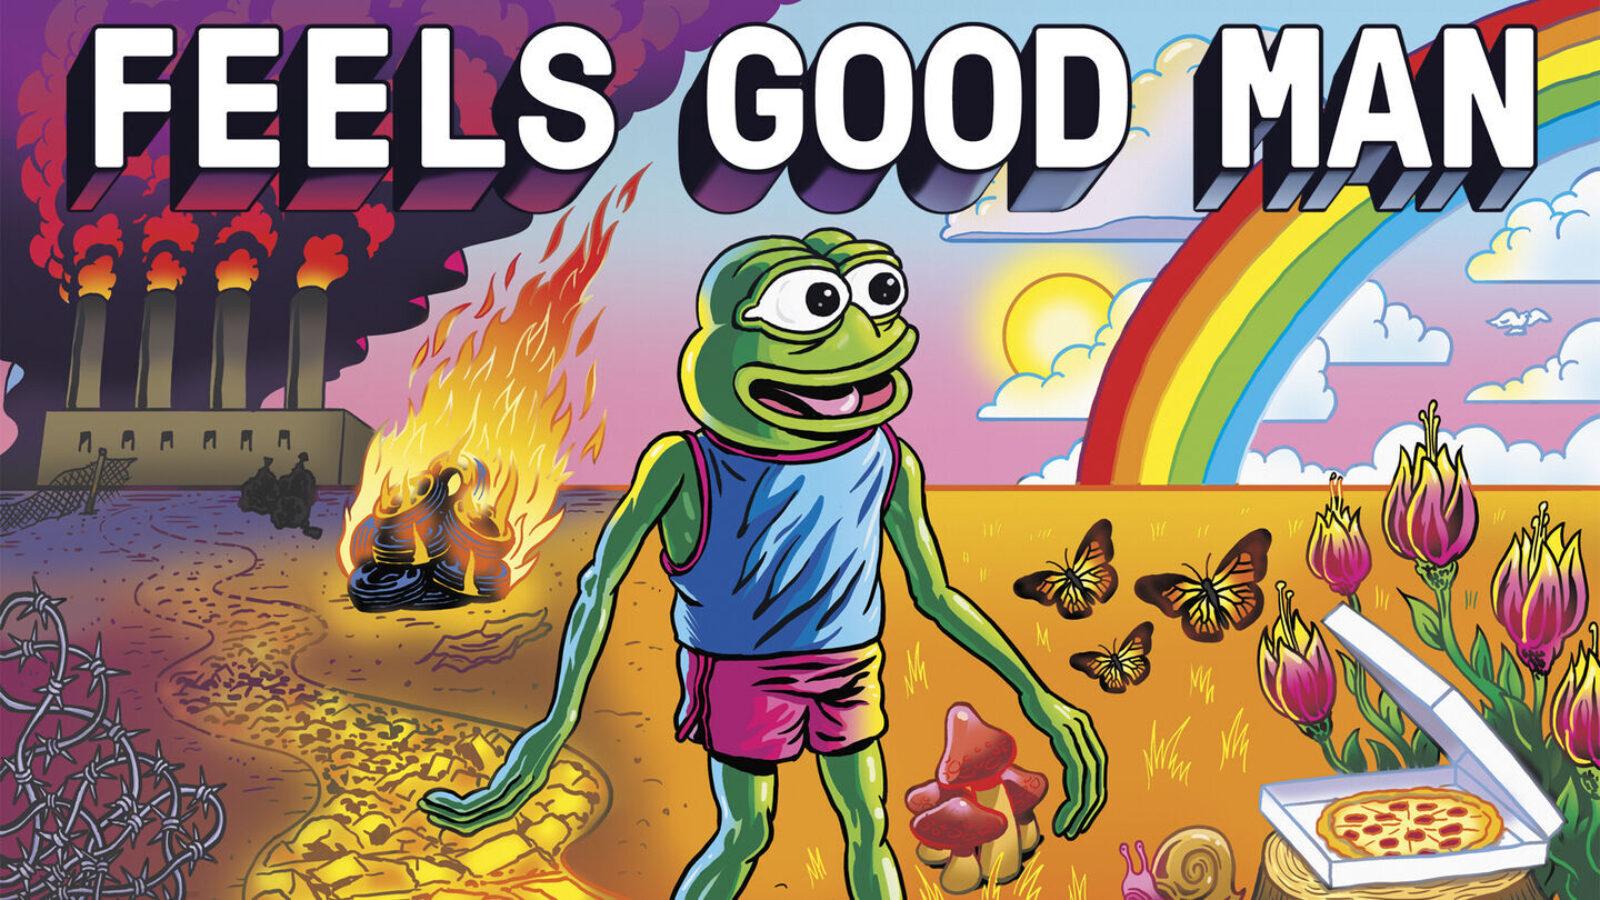 Feels Good Man 1